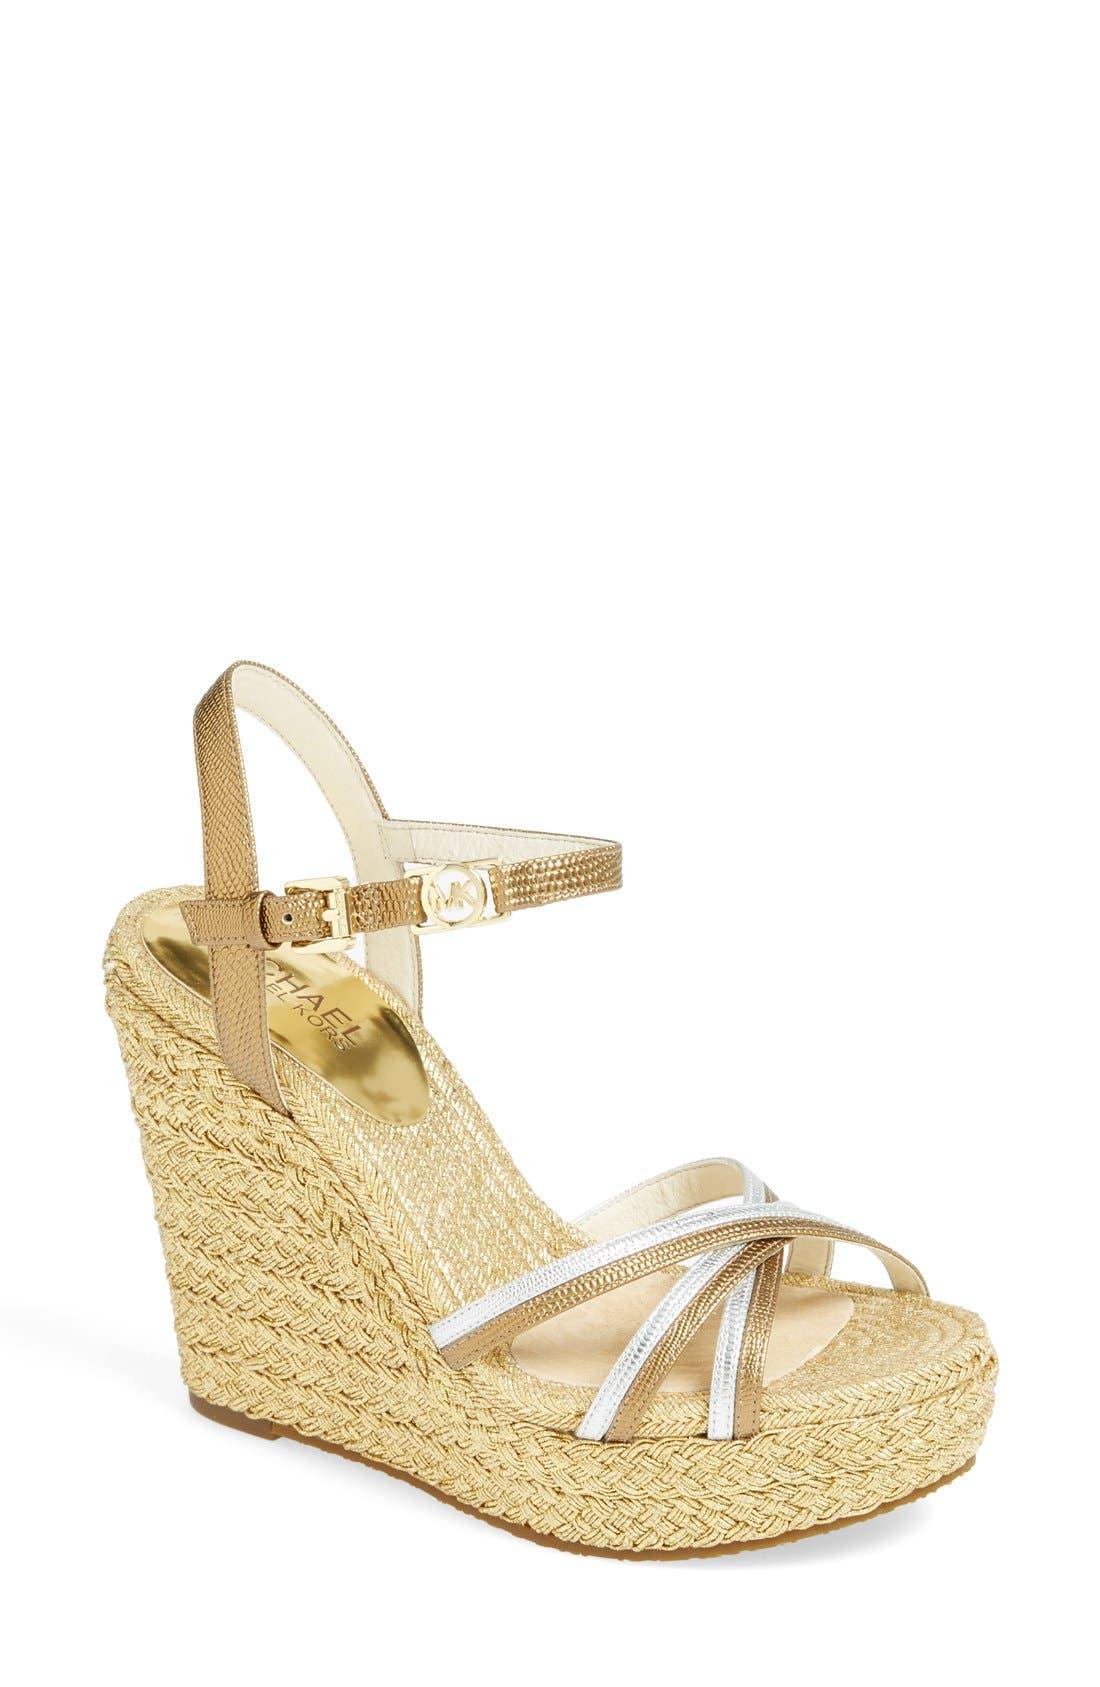 Main Image - MICHAEL Michael Kors 'Cicely' Quarter Strap Sandal